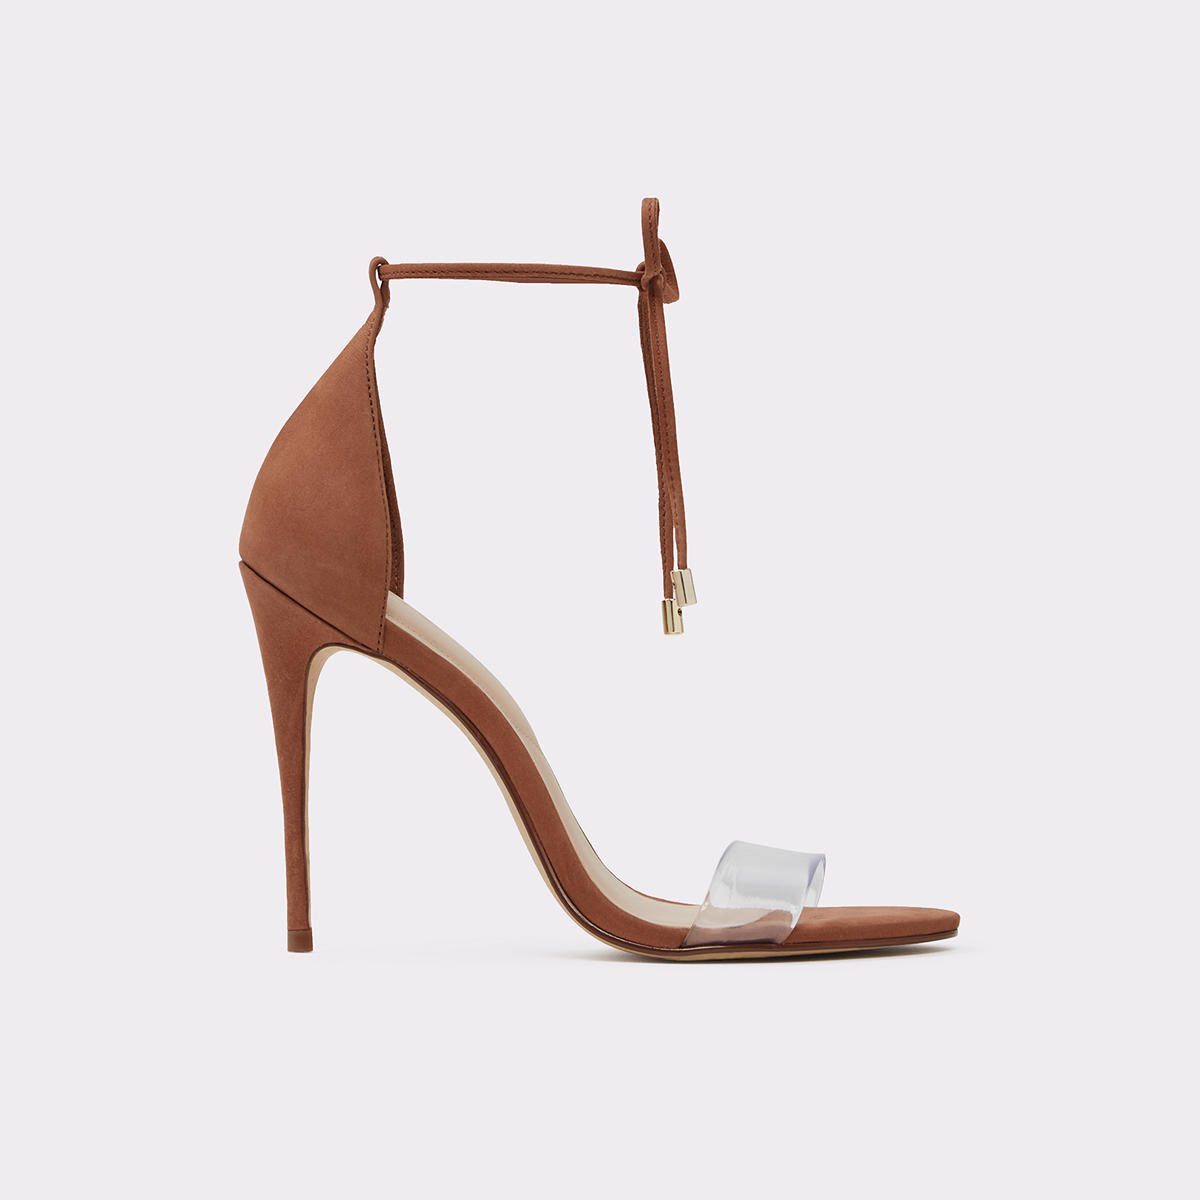 44c7498e5b0a Vaycia Bone Nubuck Women s Heeled sandals